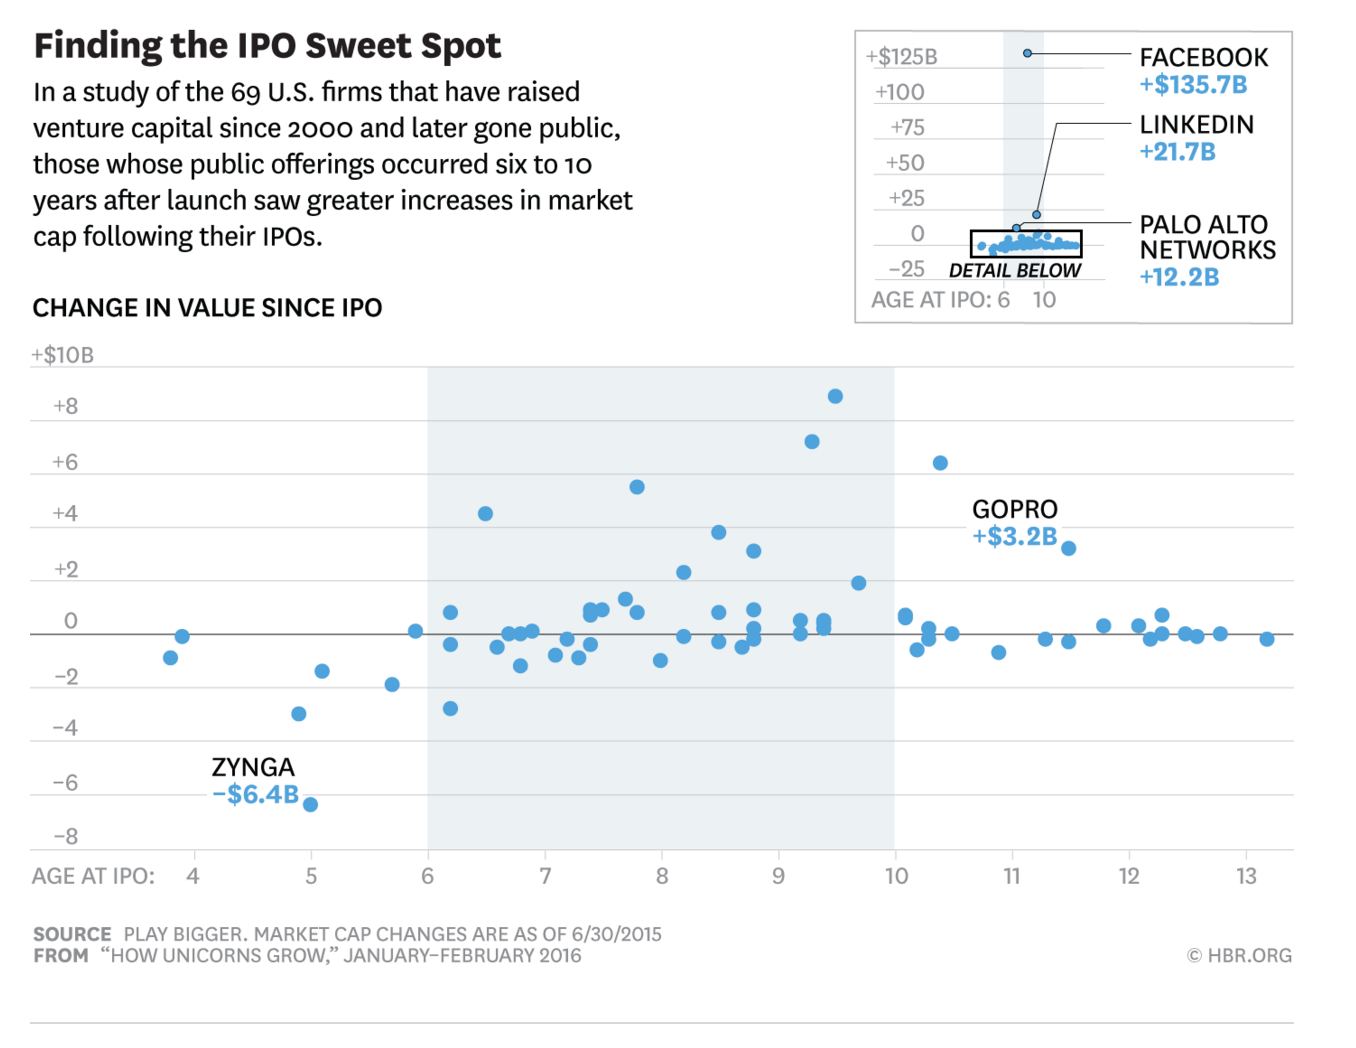 IPO Sweet Spot